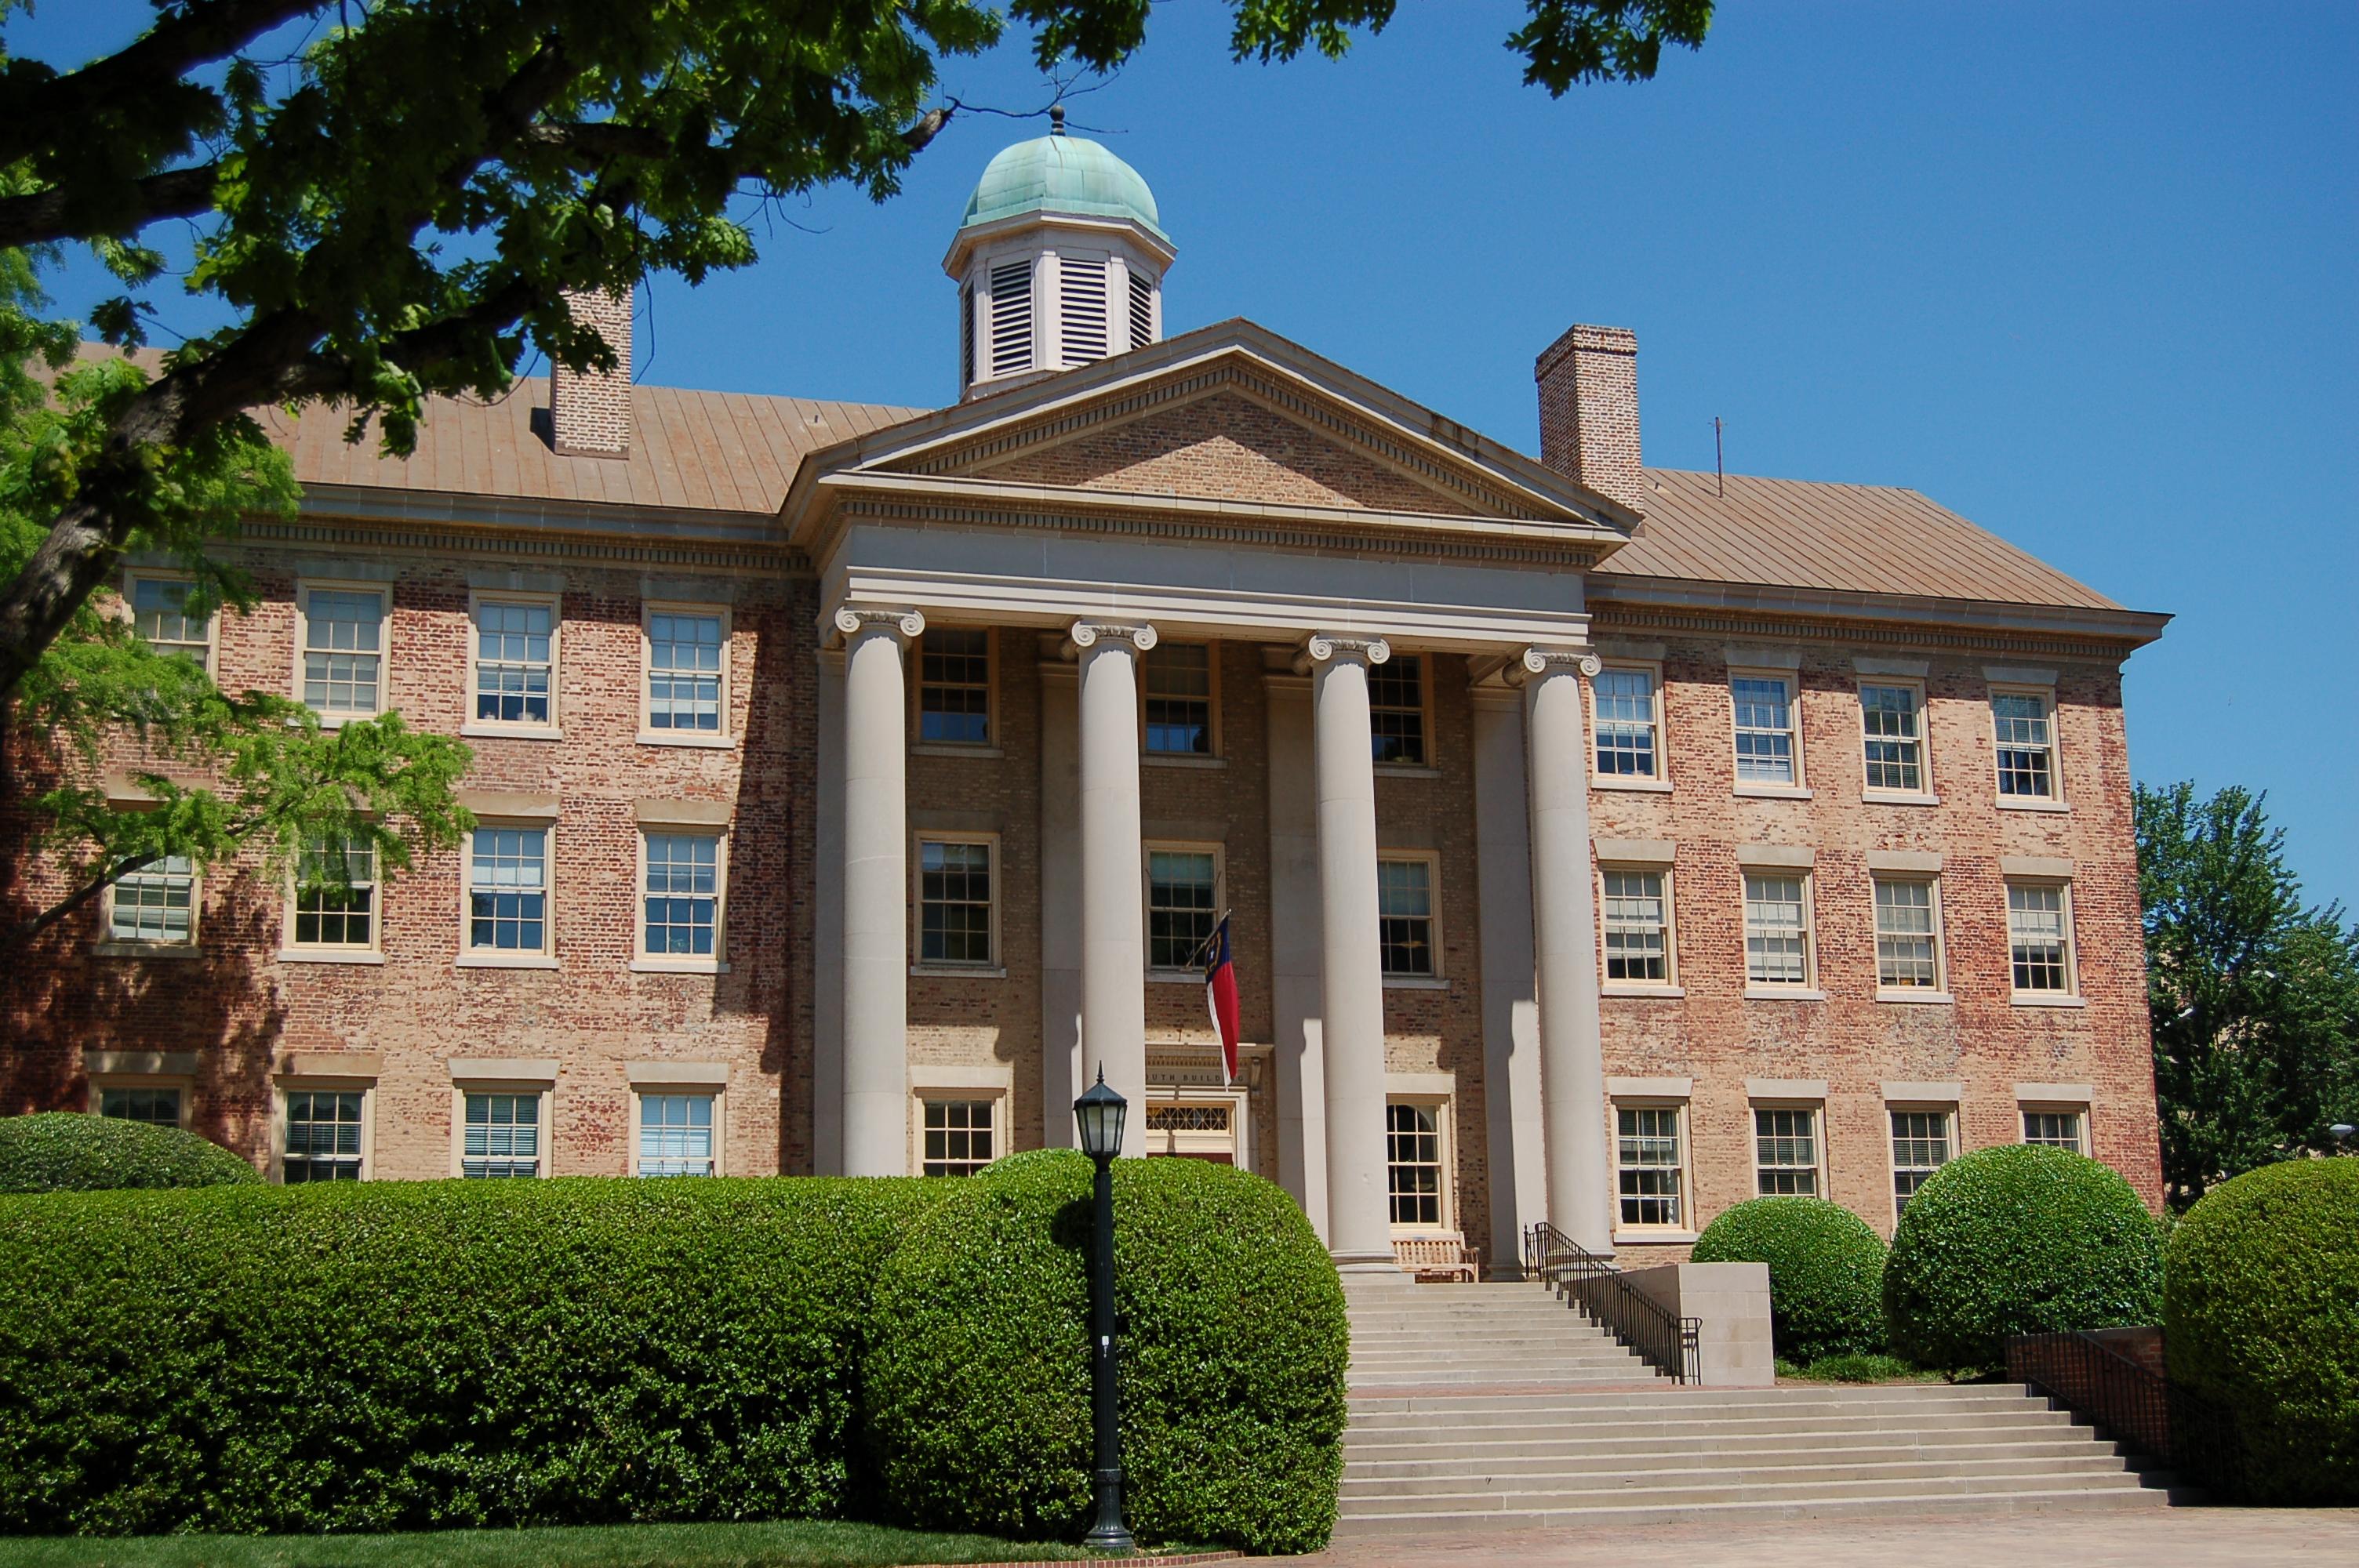 University of North Carolina Chapel Hill (UNC)